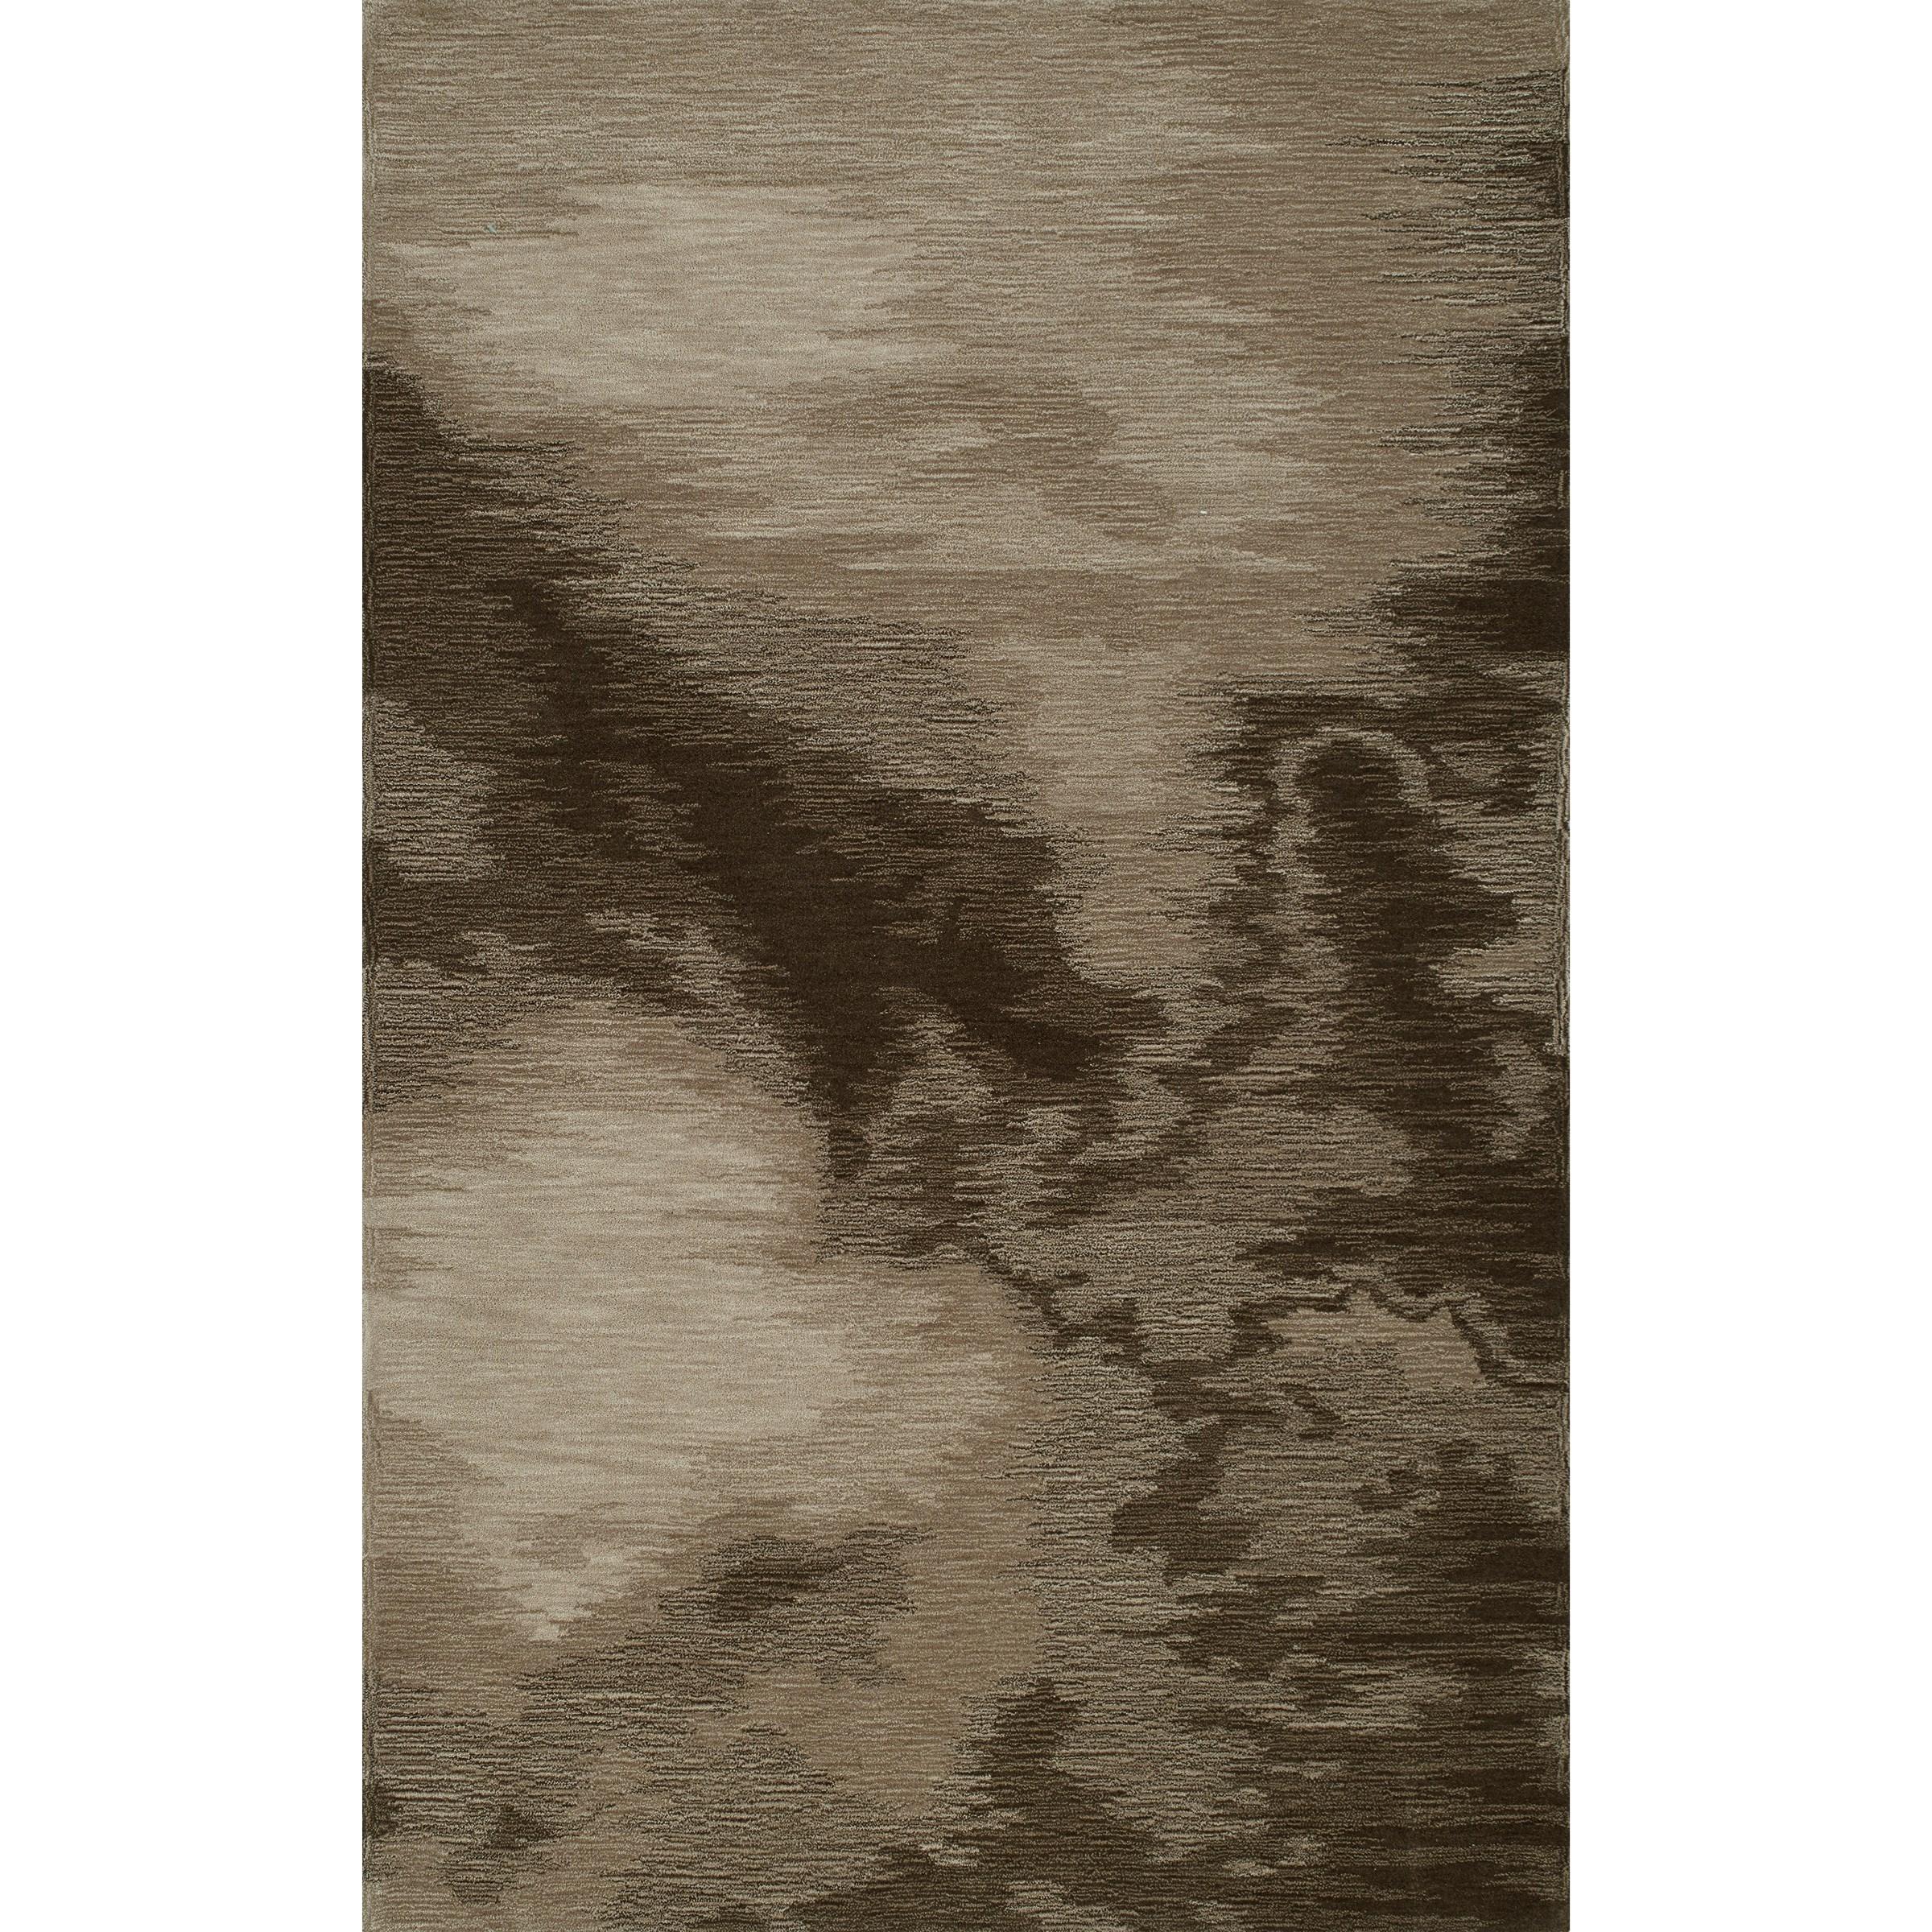 Dalyn DelMar Chocolate 8u0027X10u0027 Rug | Colderu0027s Furniture And Appliance | Rugs